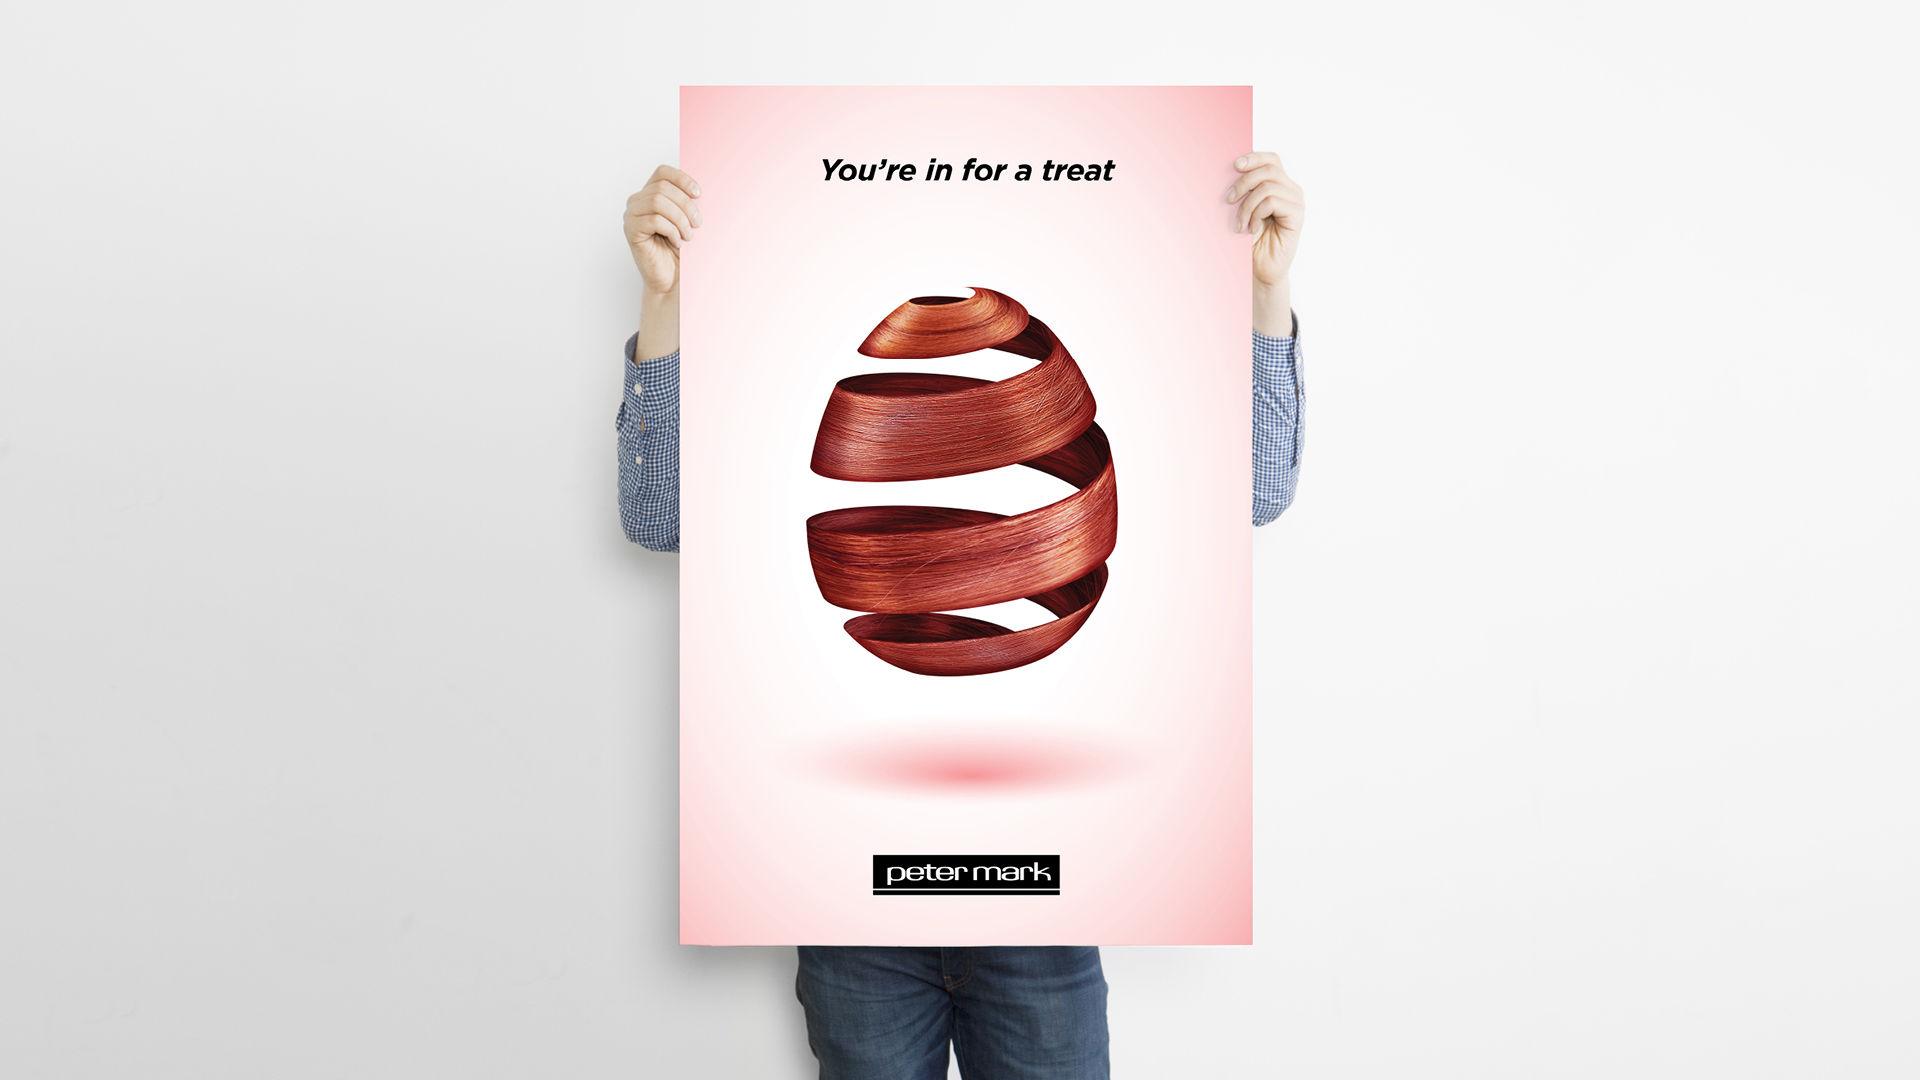 peter mark poster advertising